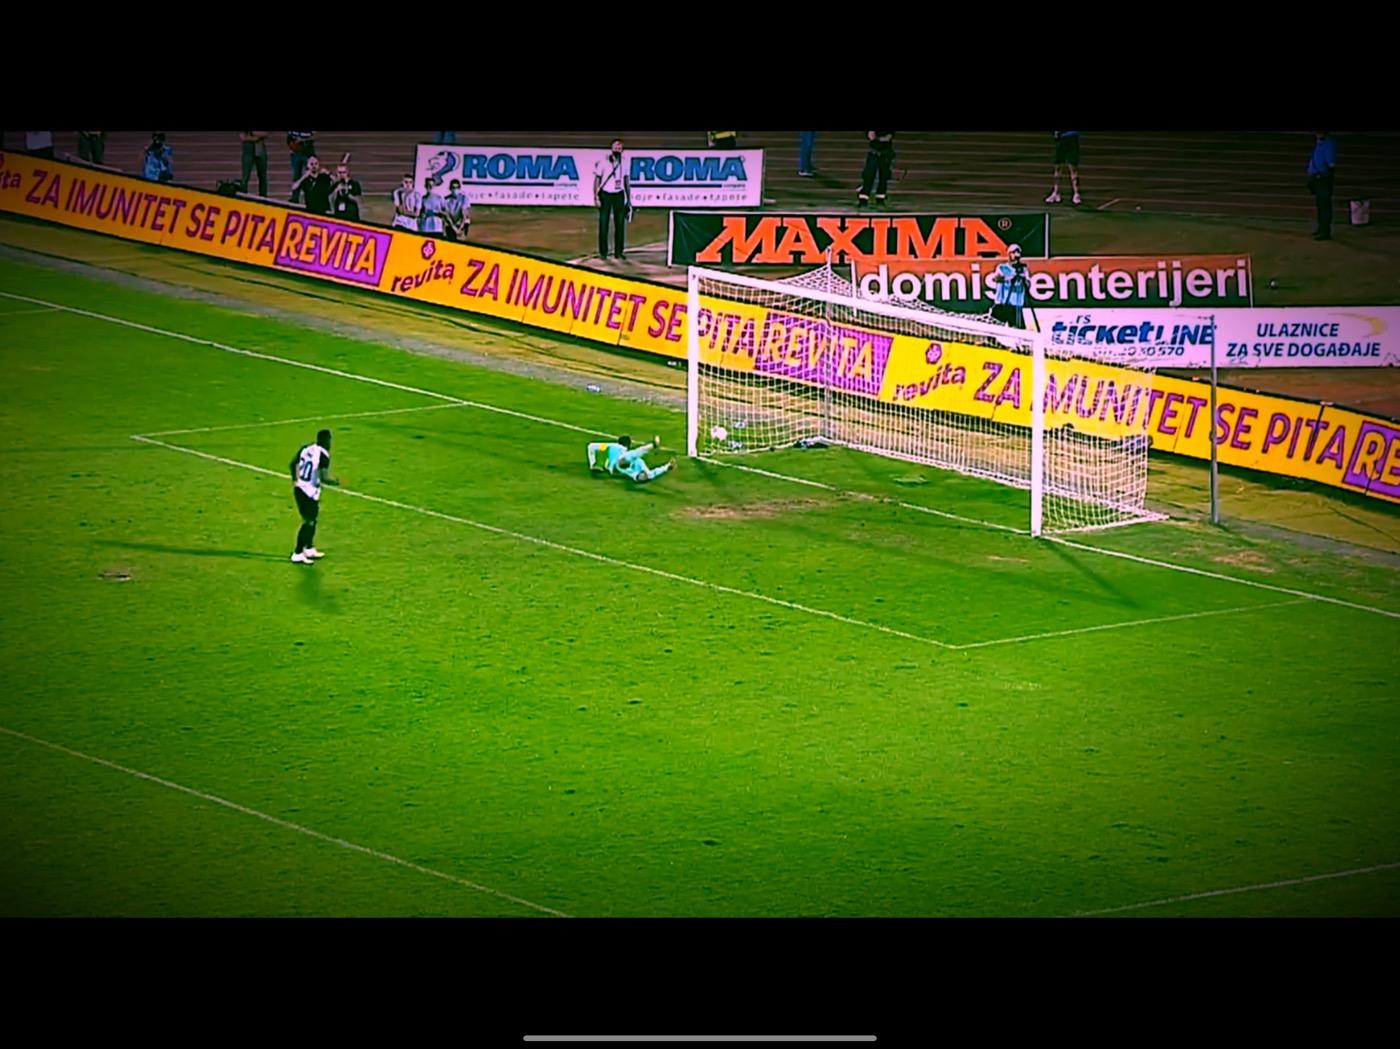 TV Izveštaj: Partizan-Soči 2:2 (4:2) Srećni rimejk penala Pjera Boje i Božja milost koja je spasila Partizan (VIDEO)